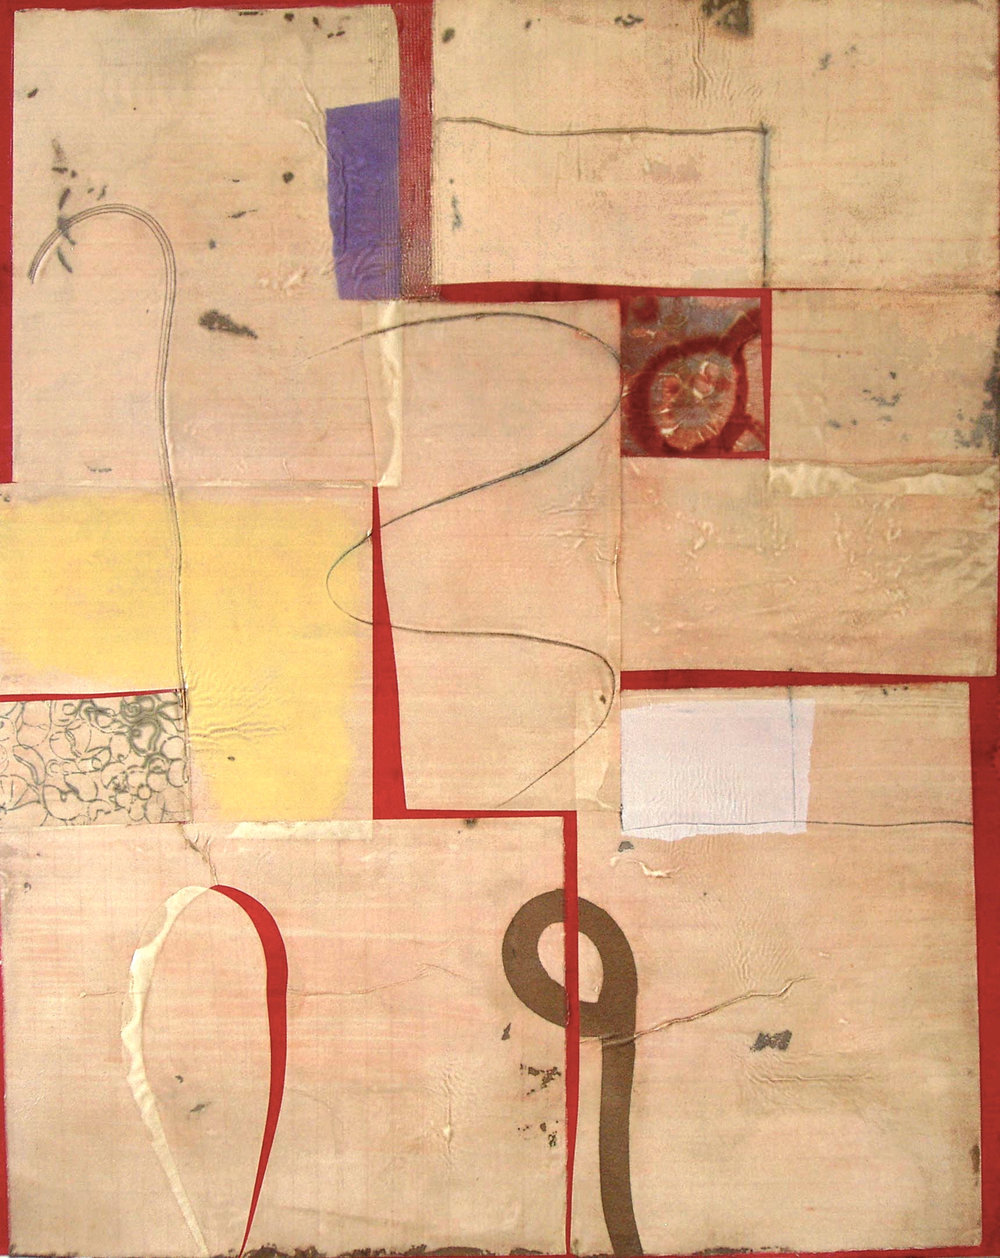 Epigram 18 60x48 inches 152x122 cm oil, gel, paper on canvas 2014